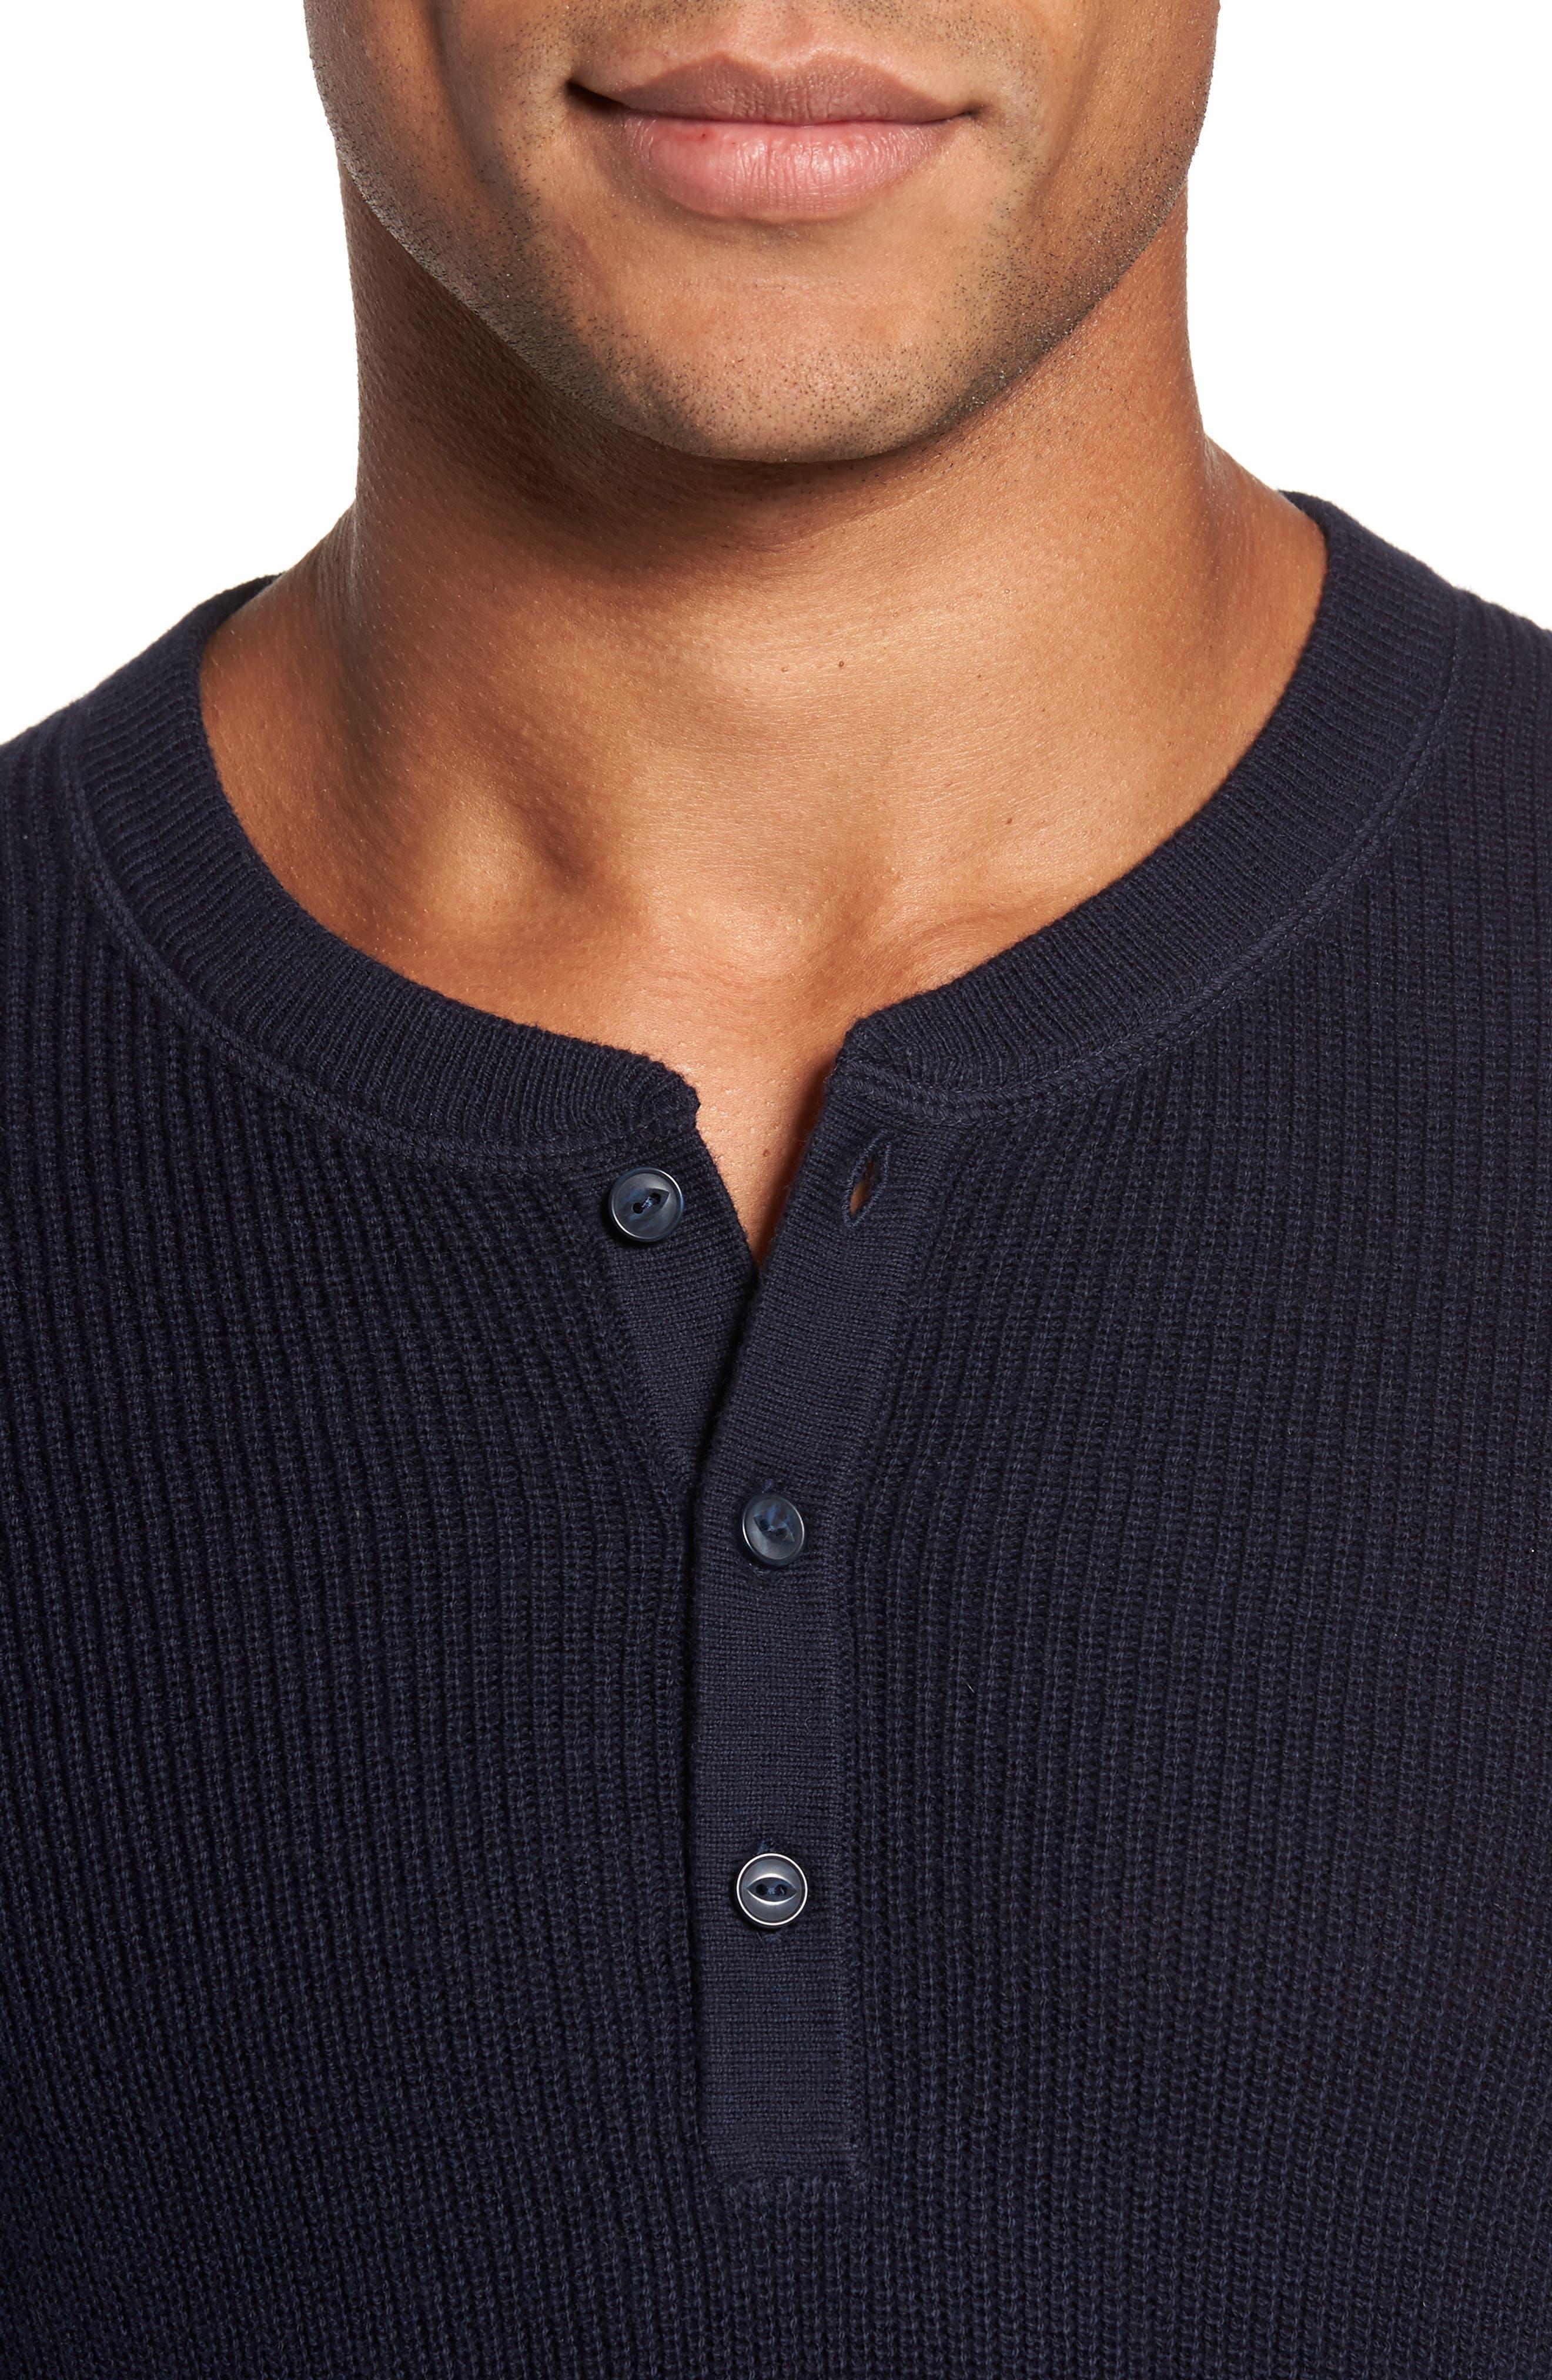 Cotton & Cashmere Henley Sweater,                             Alternate thumbnail 11, color,